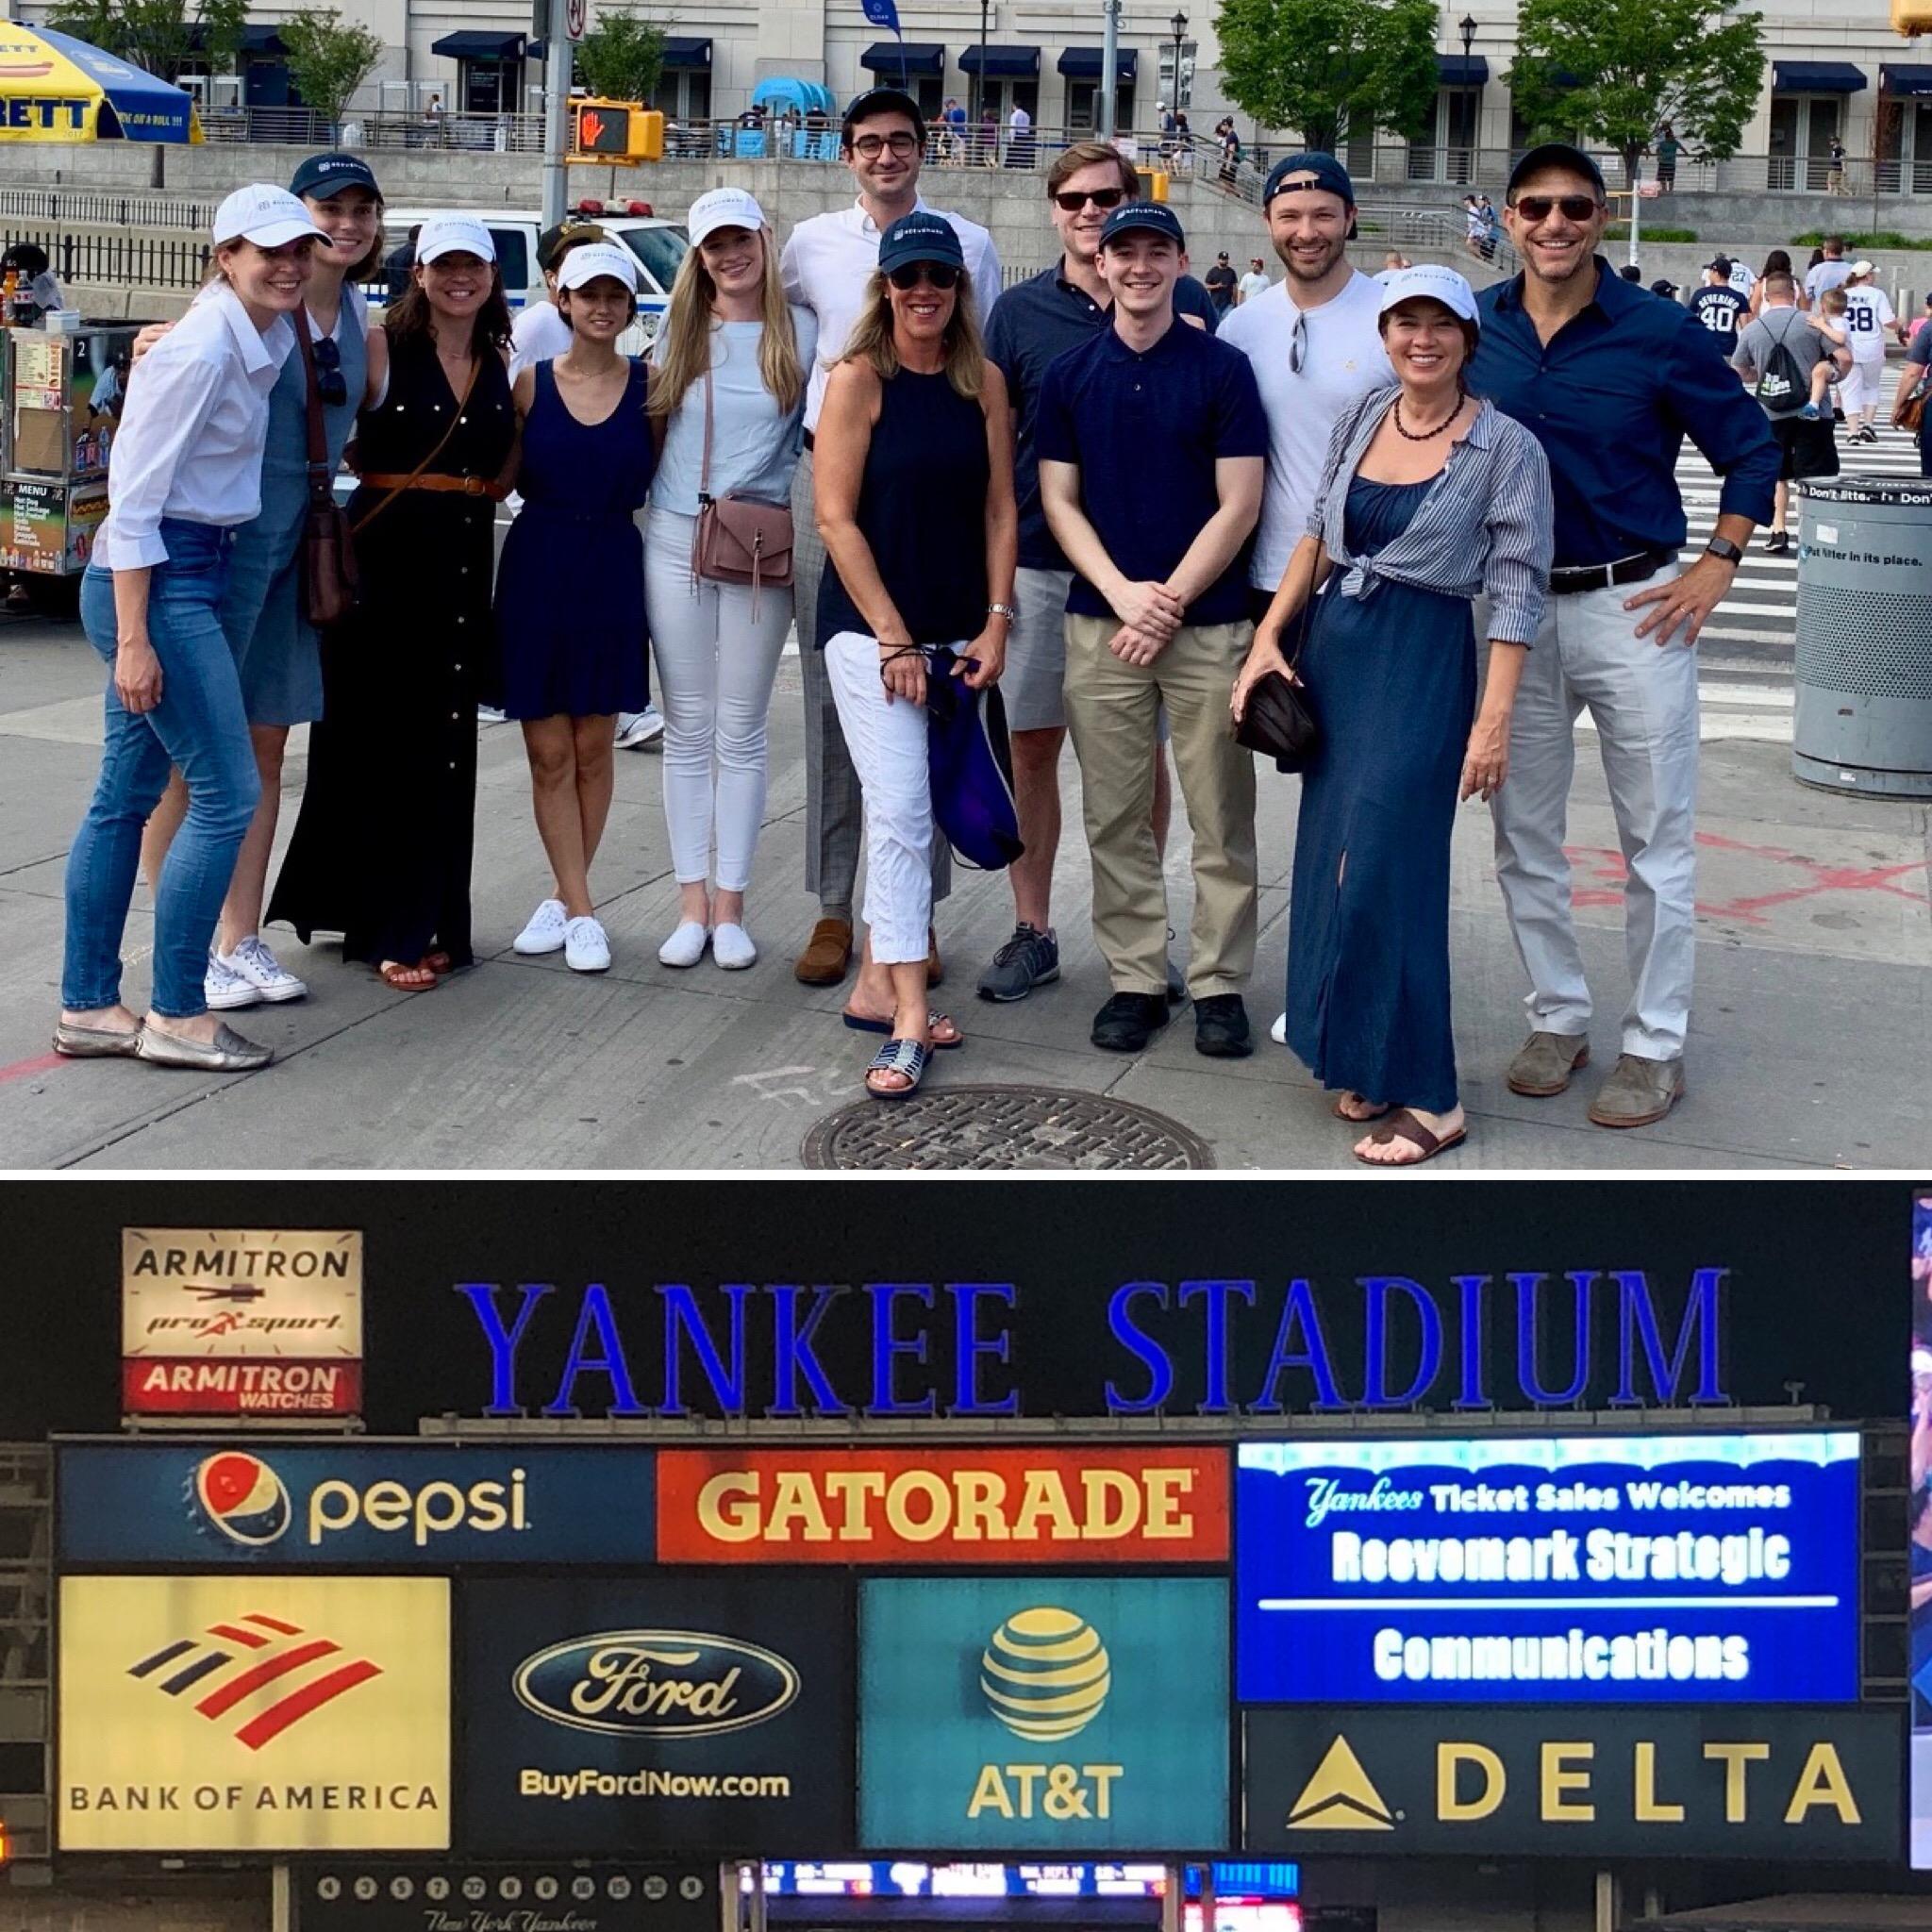 Reevemark's Summer Outing at Yankee Stadium